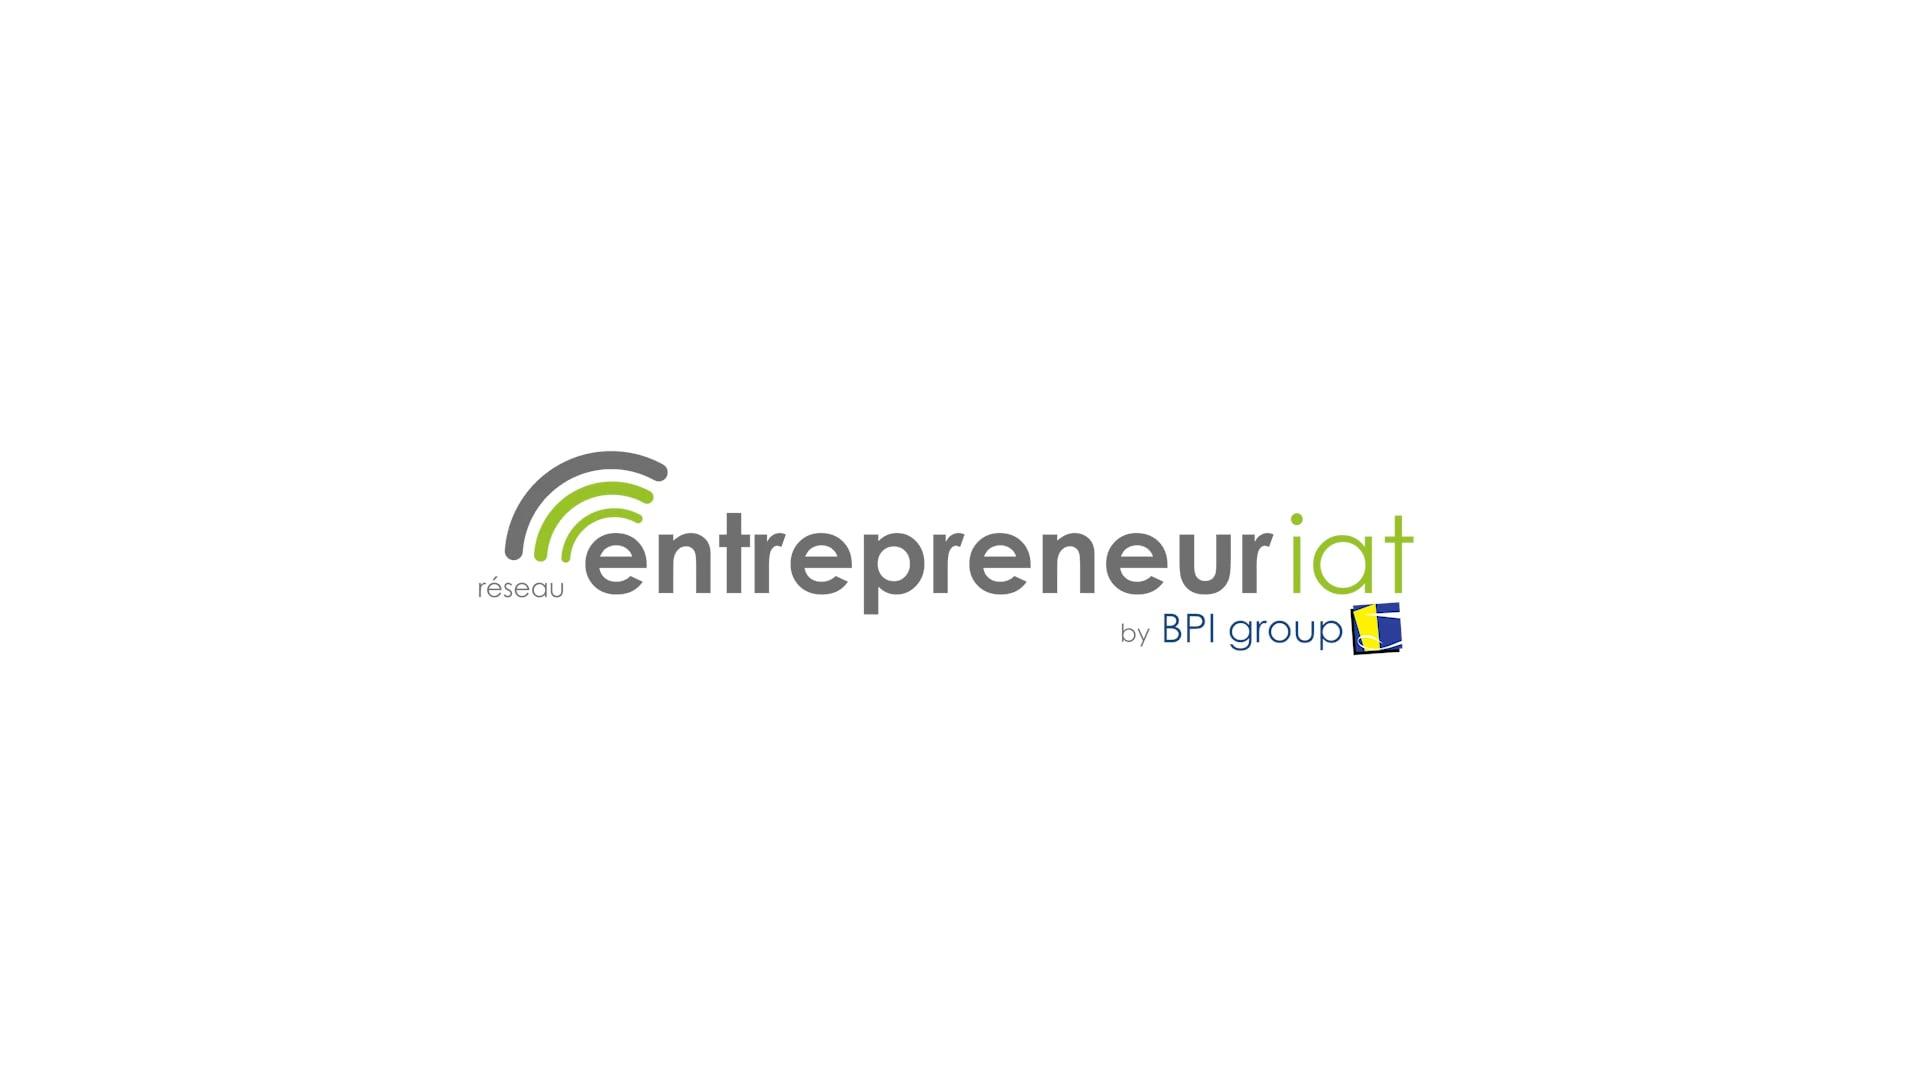 Accompagnement entrepreneuriat chez BPI group